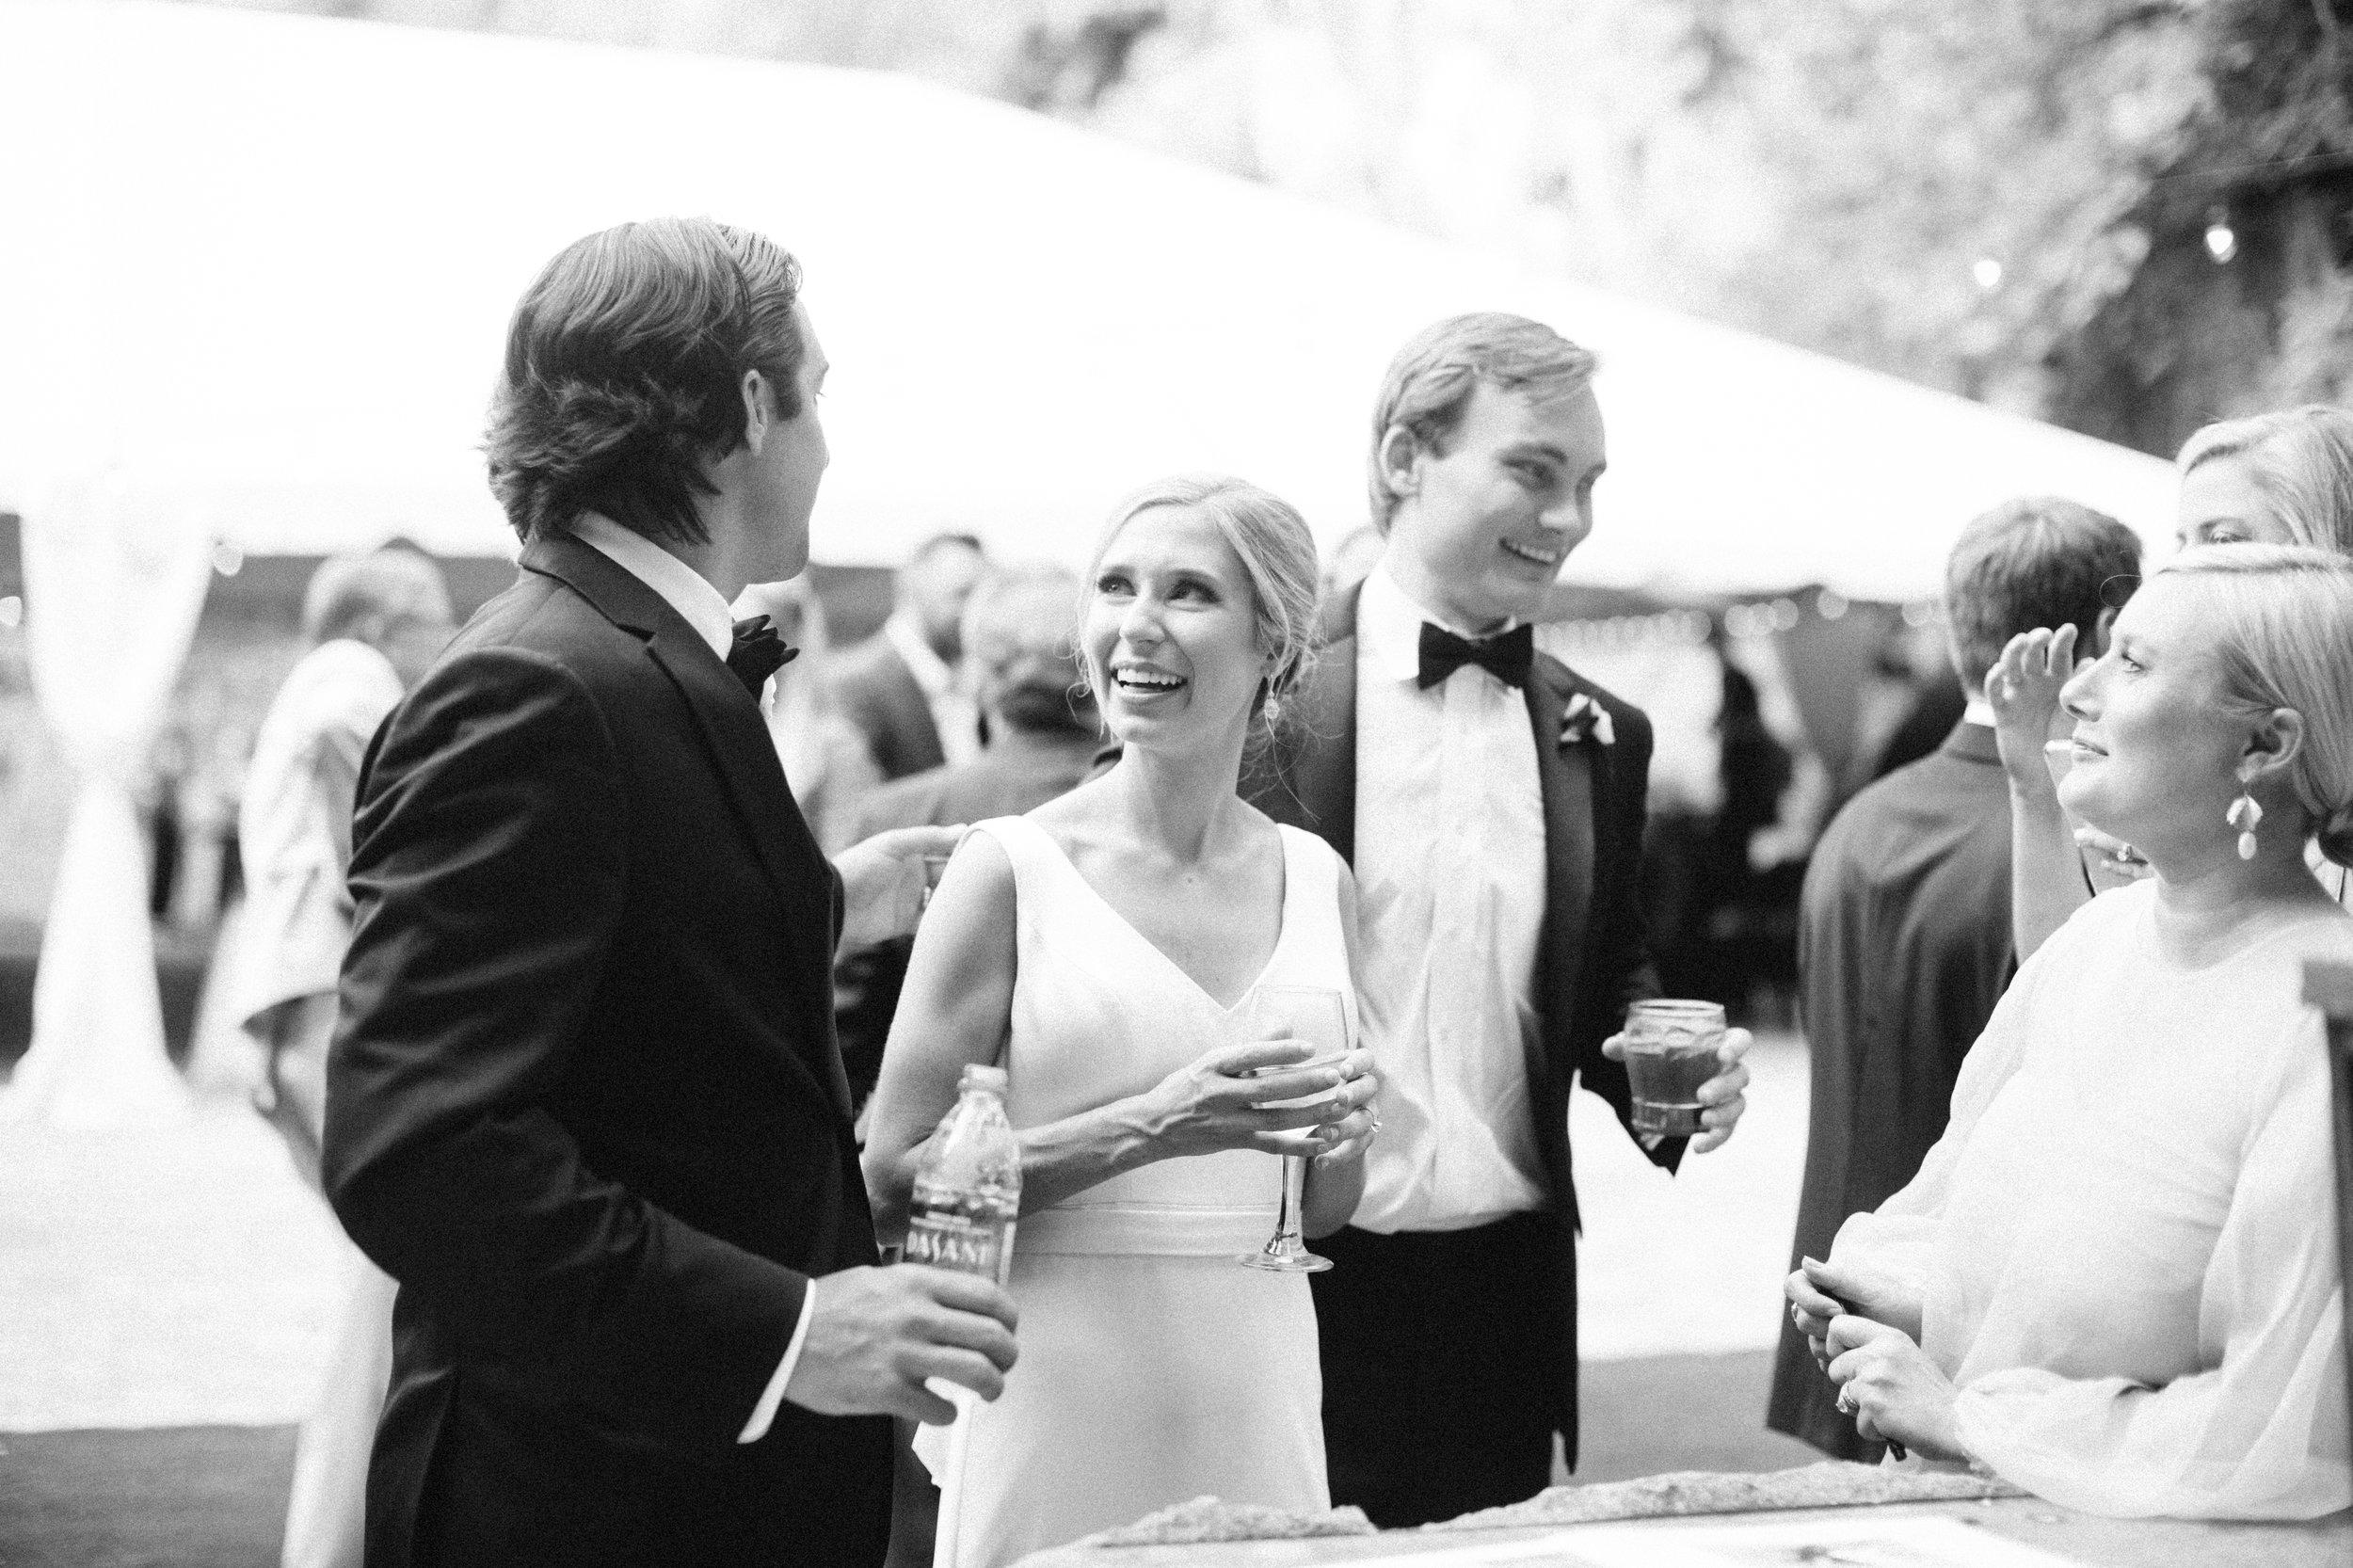 Olivia_Patrick_Wedding_Quarry_Venue_Abigail_Malone_Photography_Knoxville-821.jpg